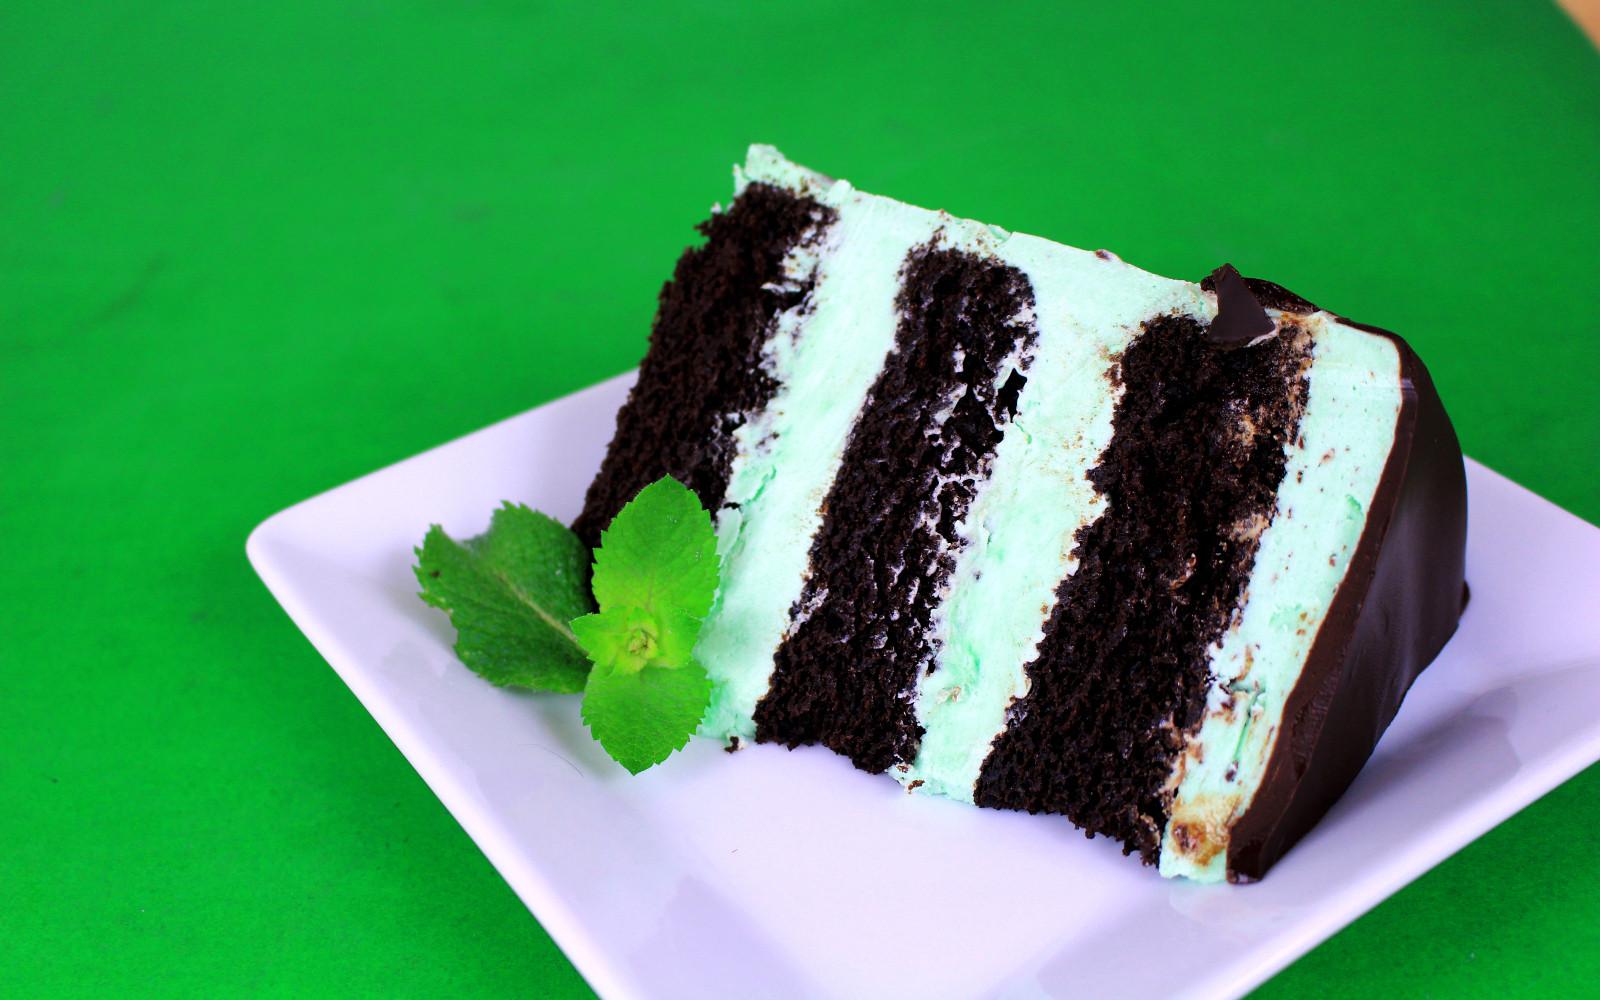 Mint Chocolate Chip Cake  Mint Chocolate Chip Cake [Vegan Grain Free]